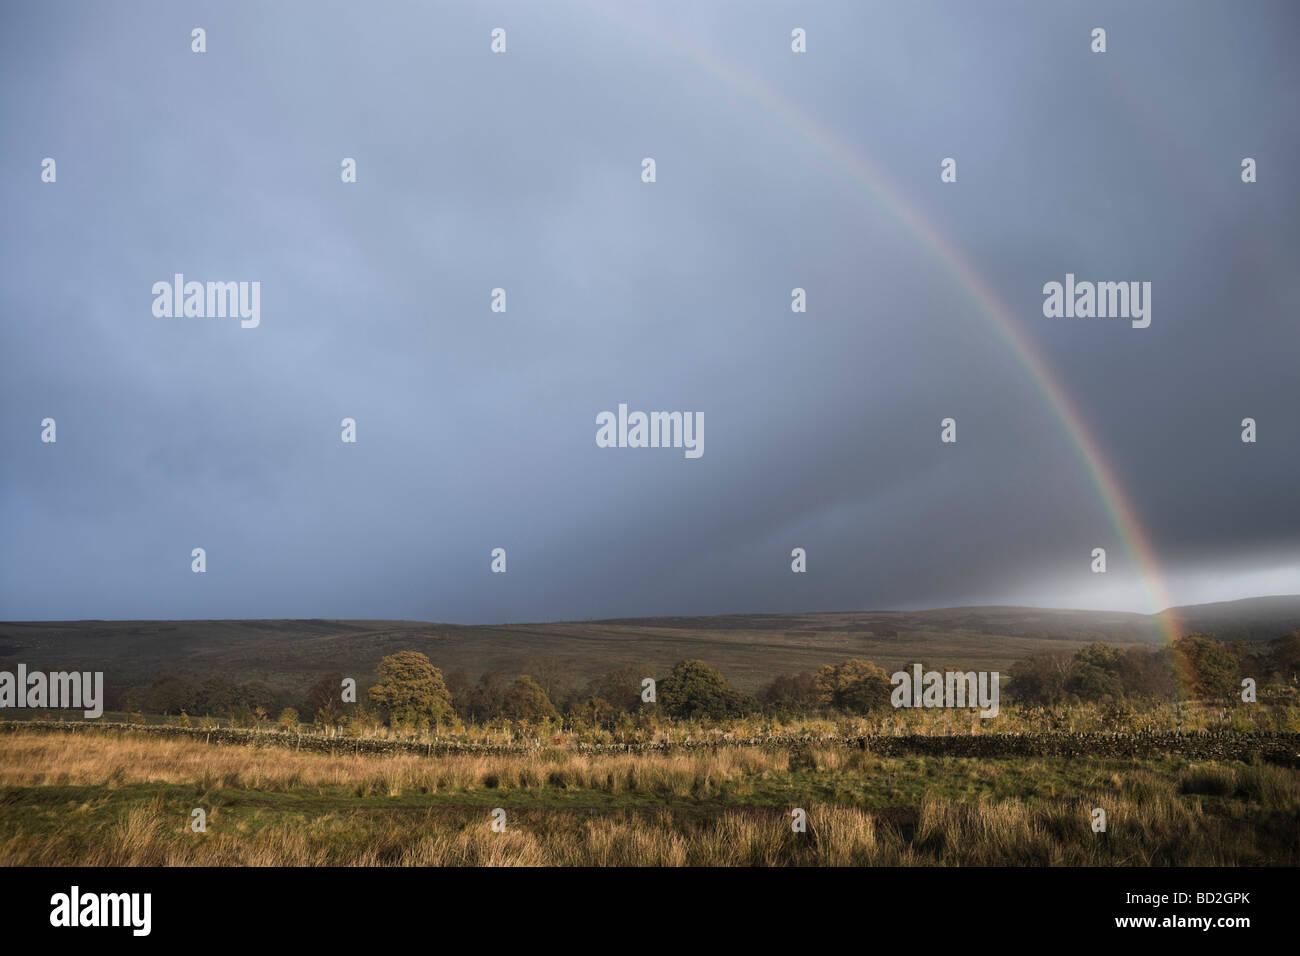 Regenbögen Ende in Landschaft Stockbild